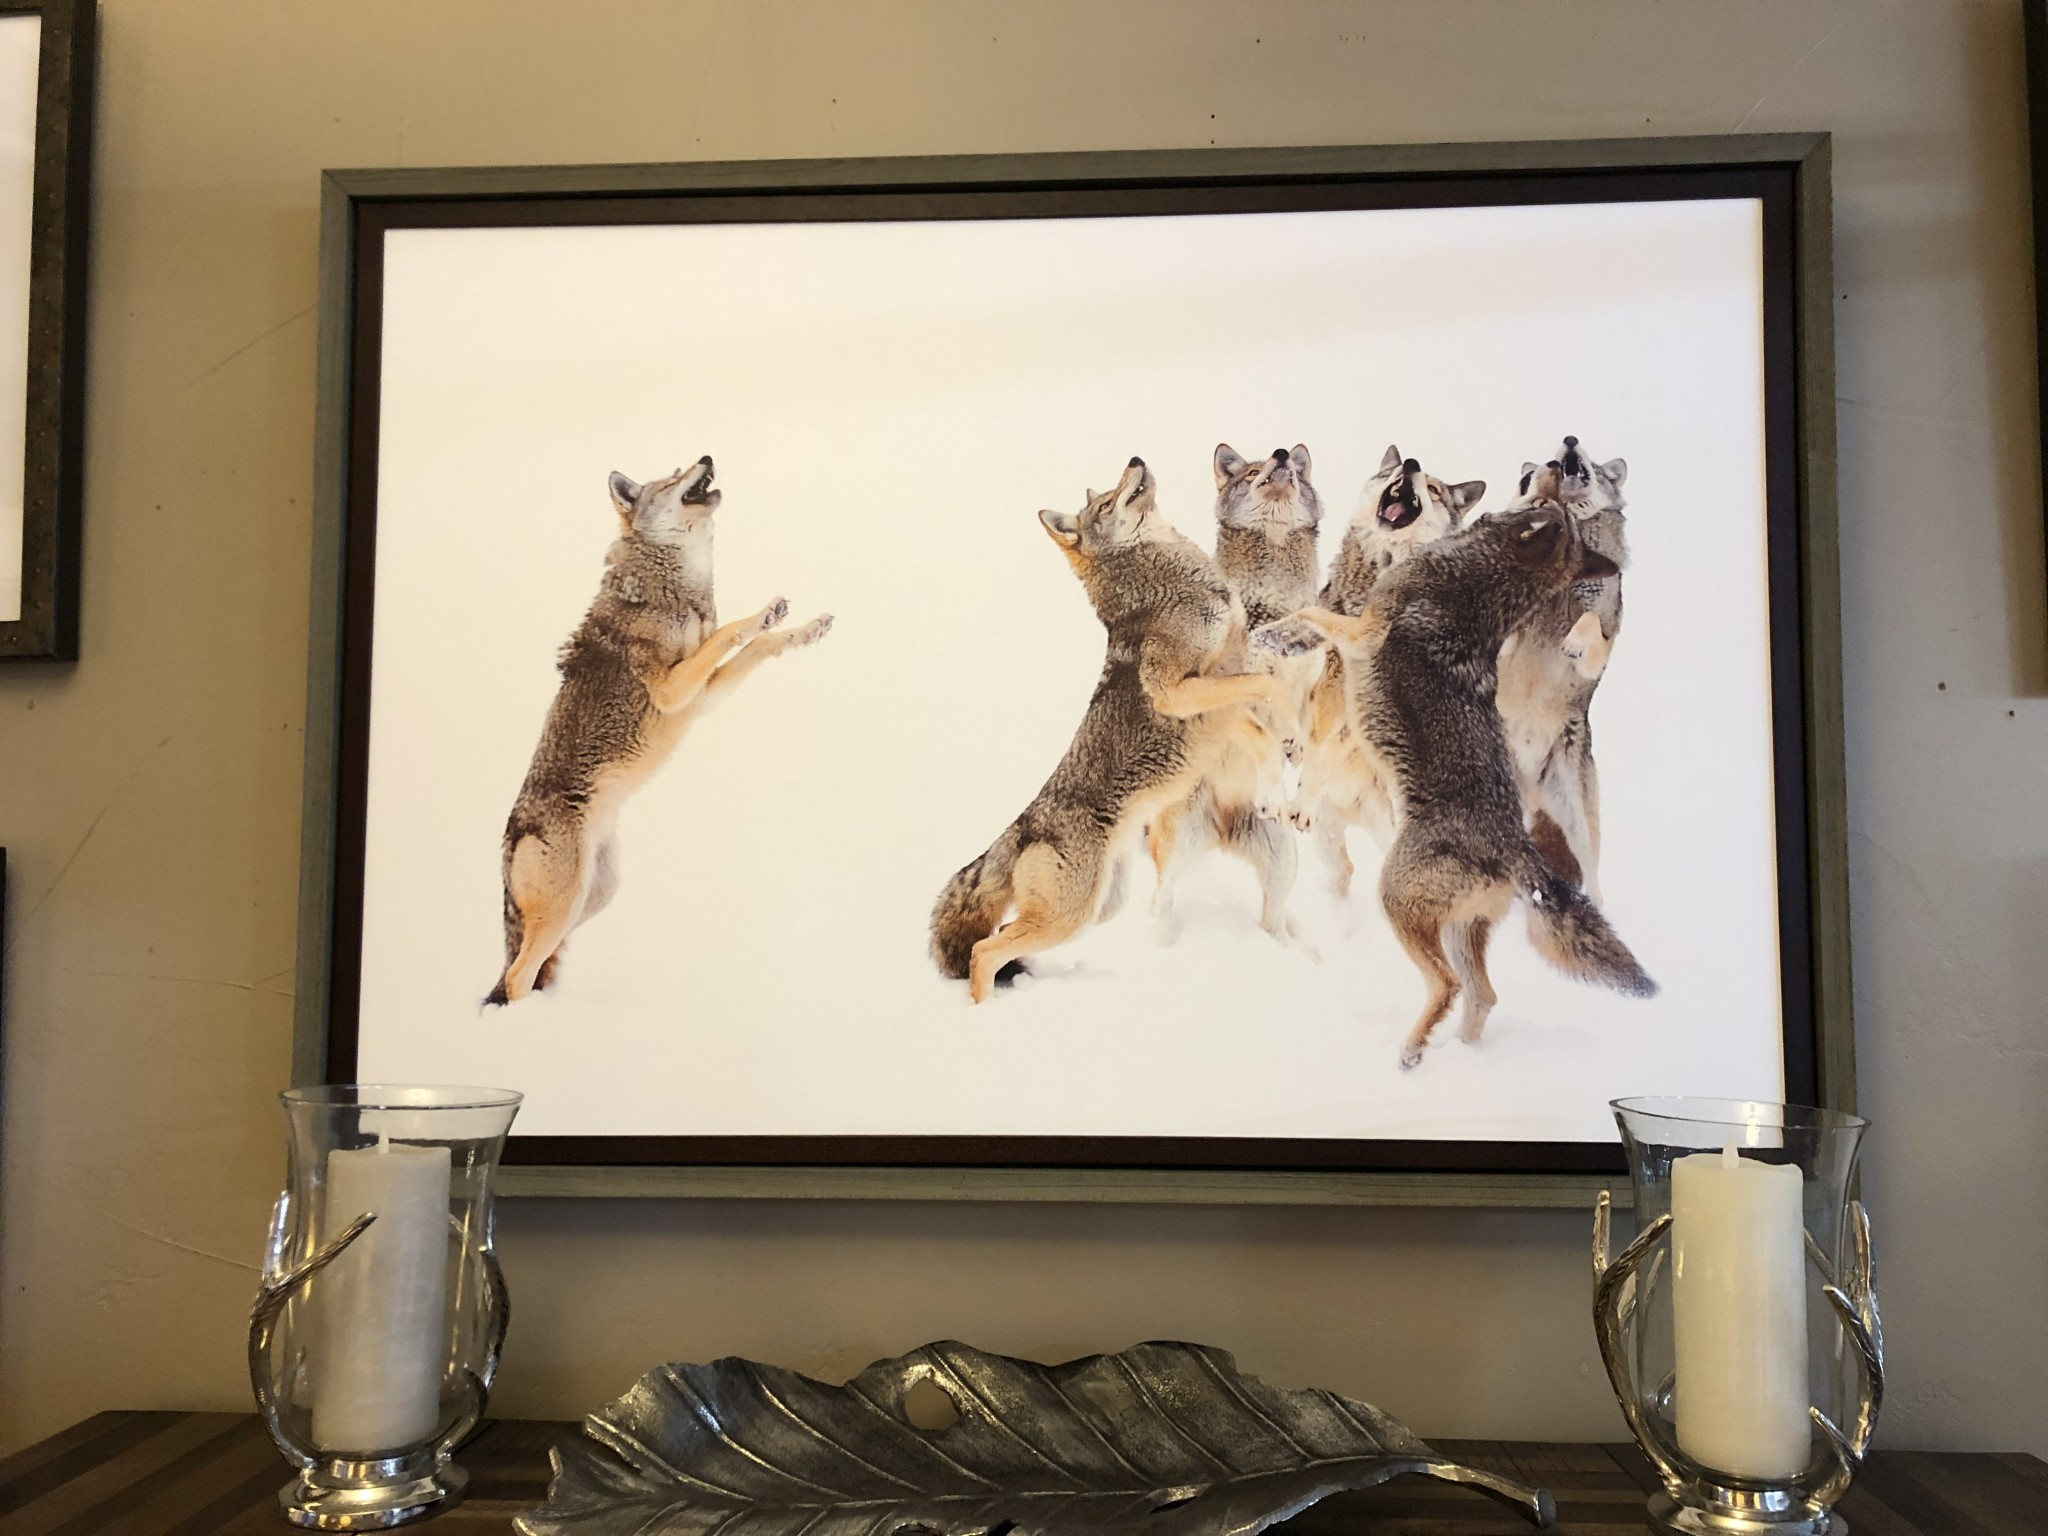 TAC The Choir Coyotes